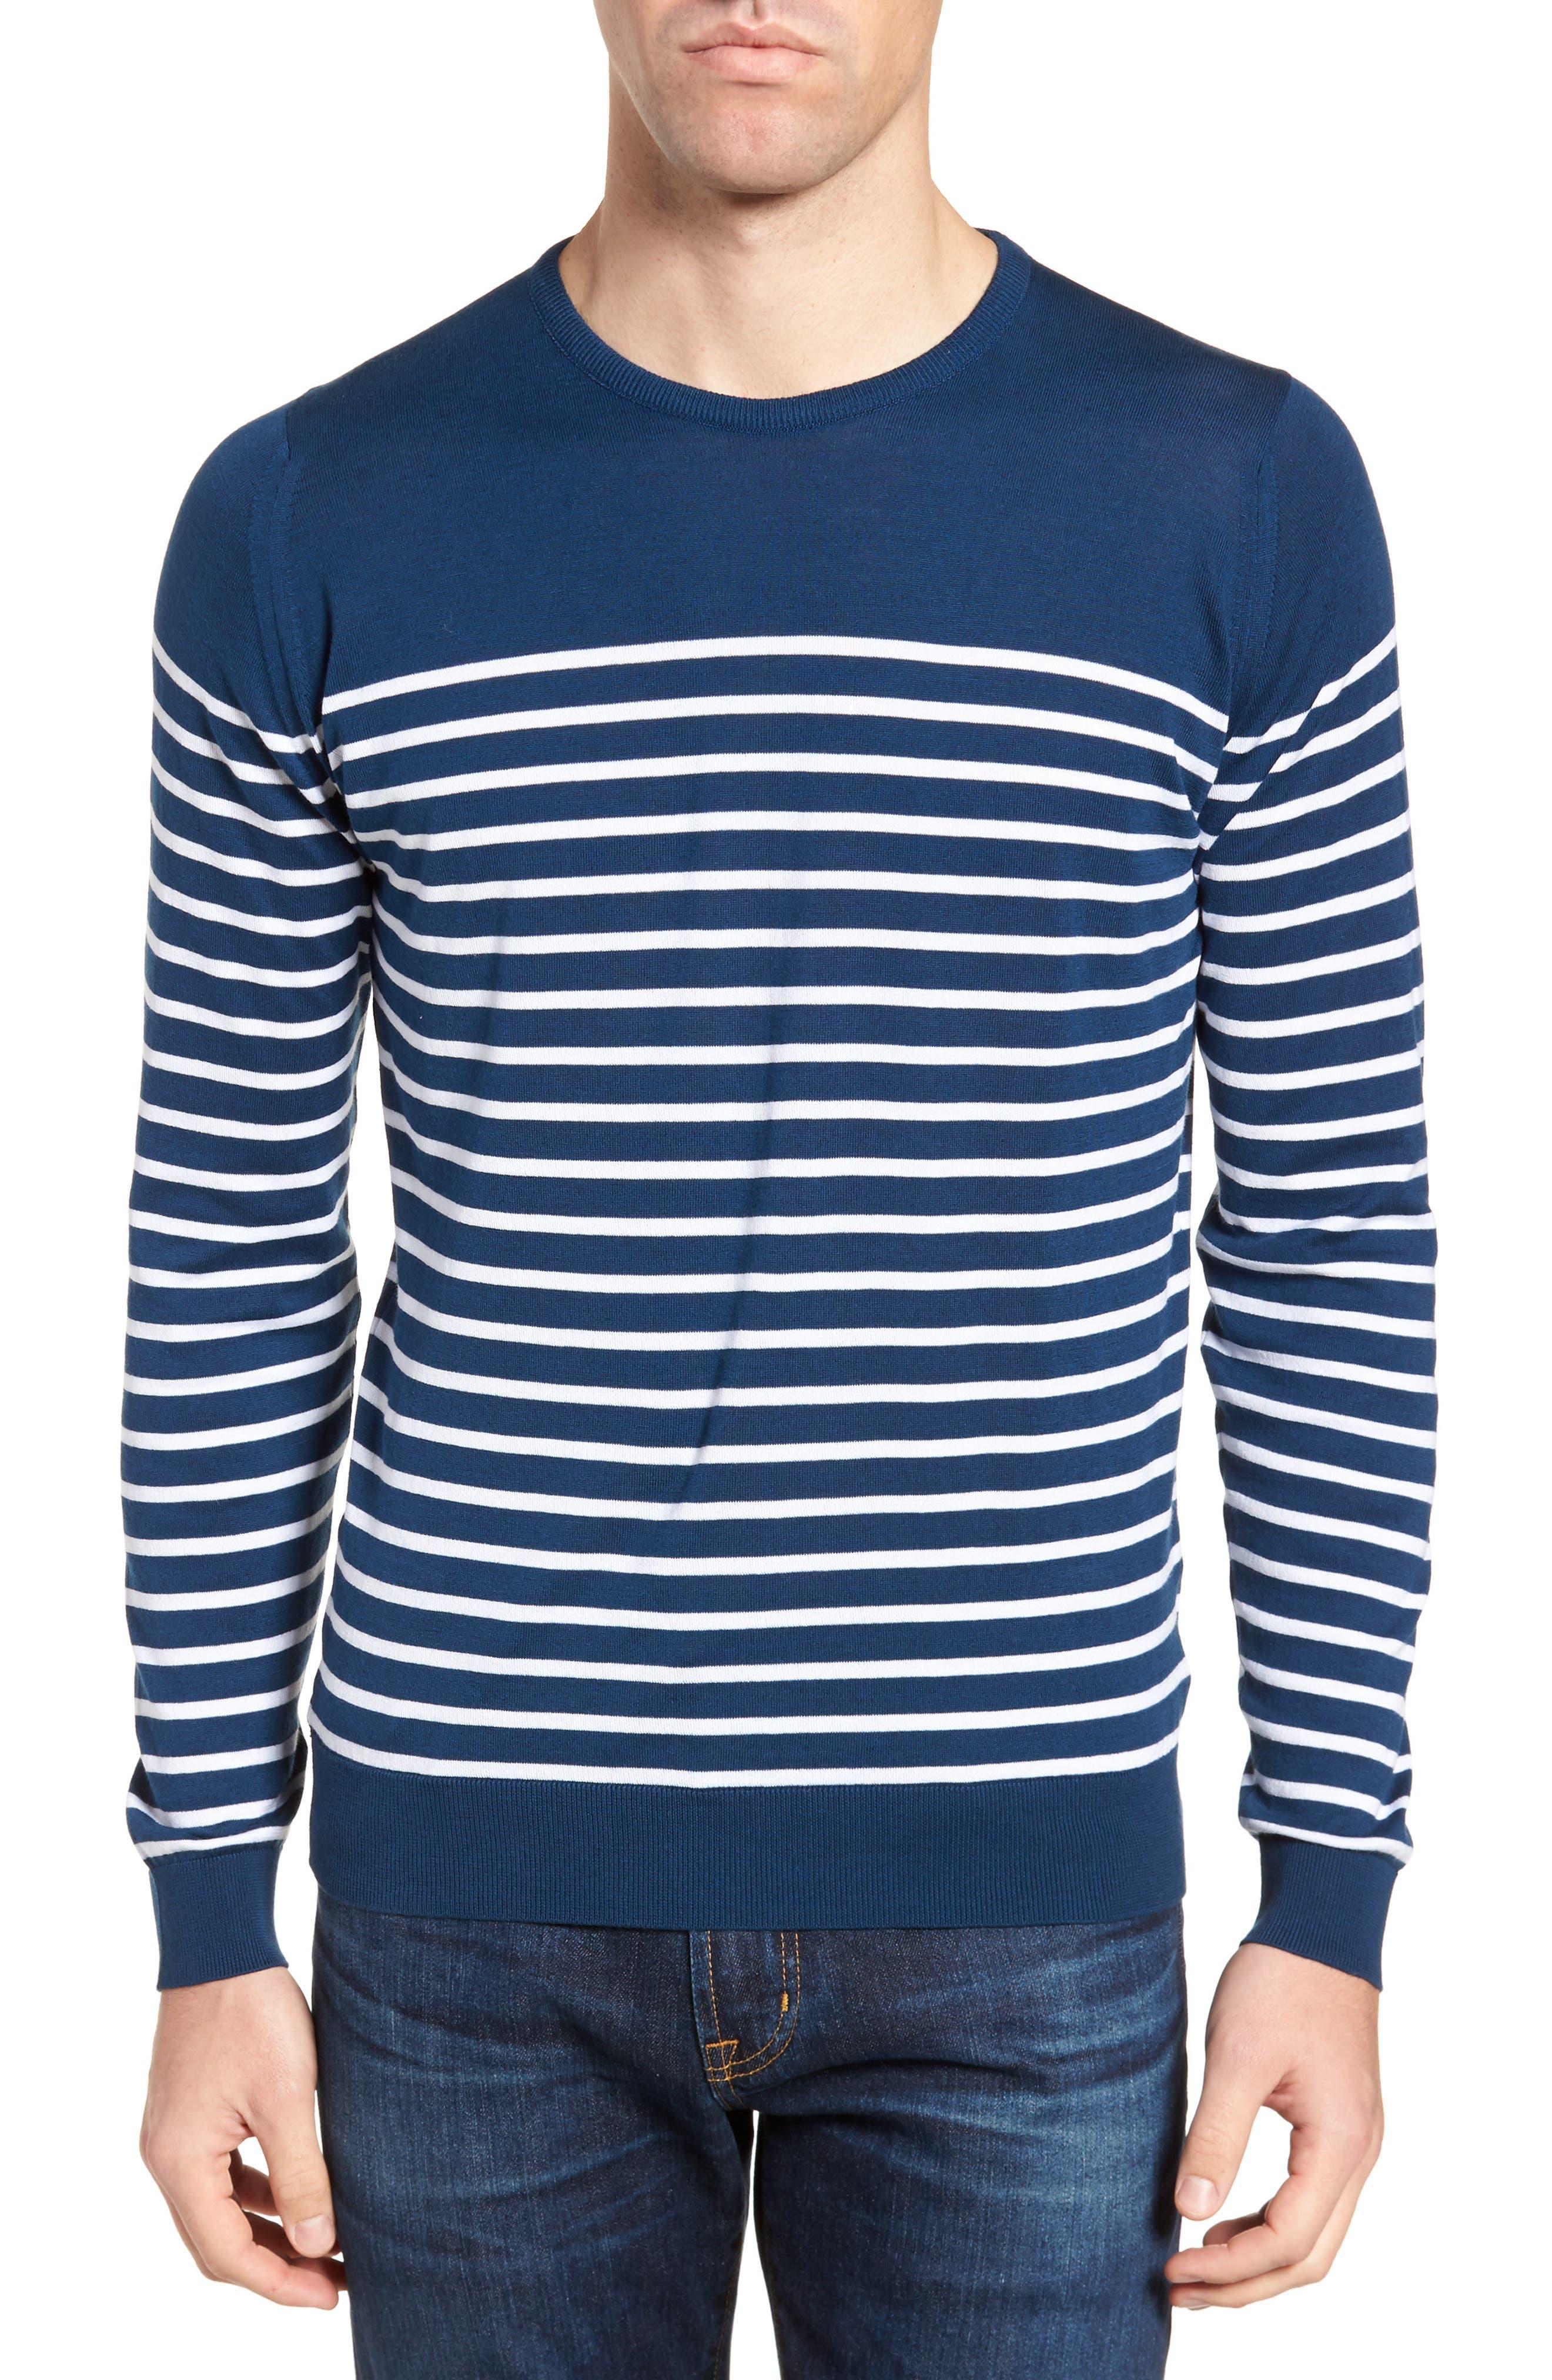 John Smedley Stripe Sweater